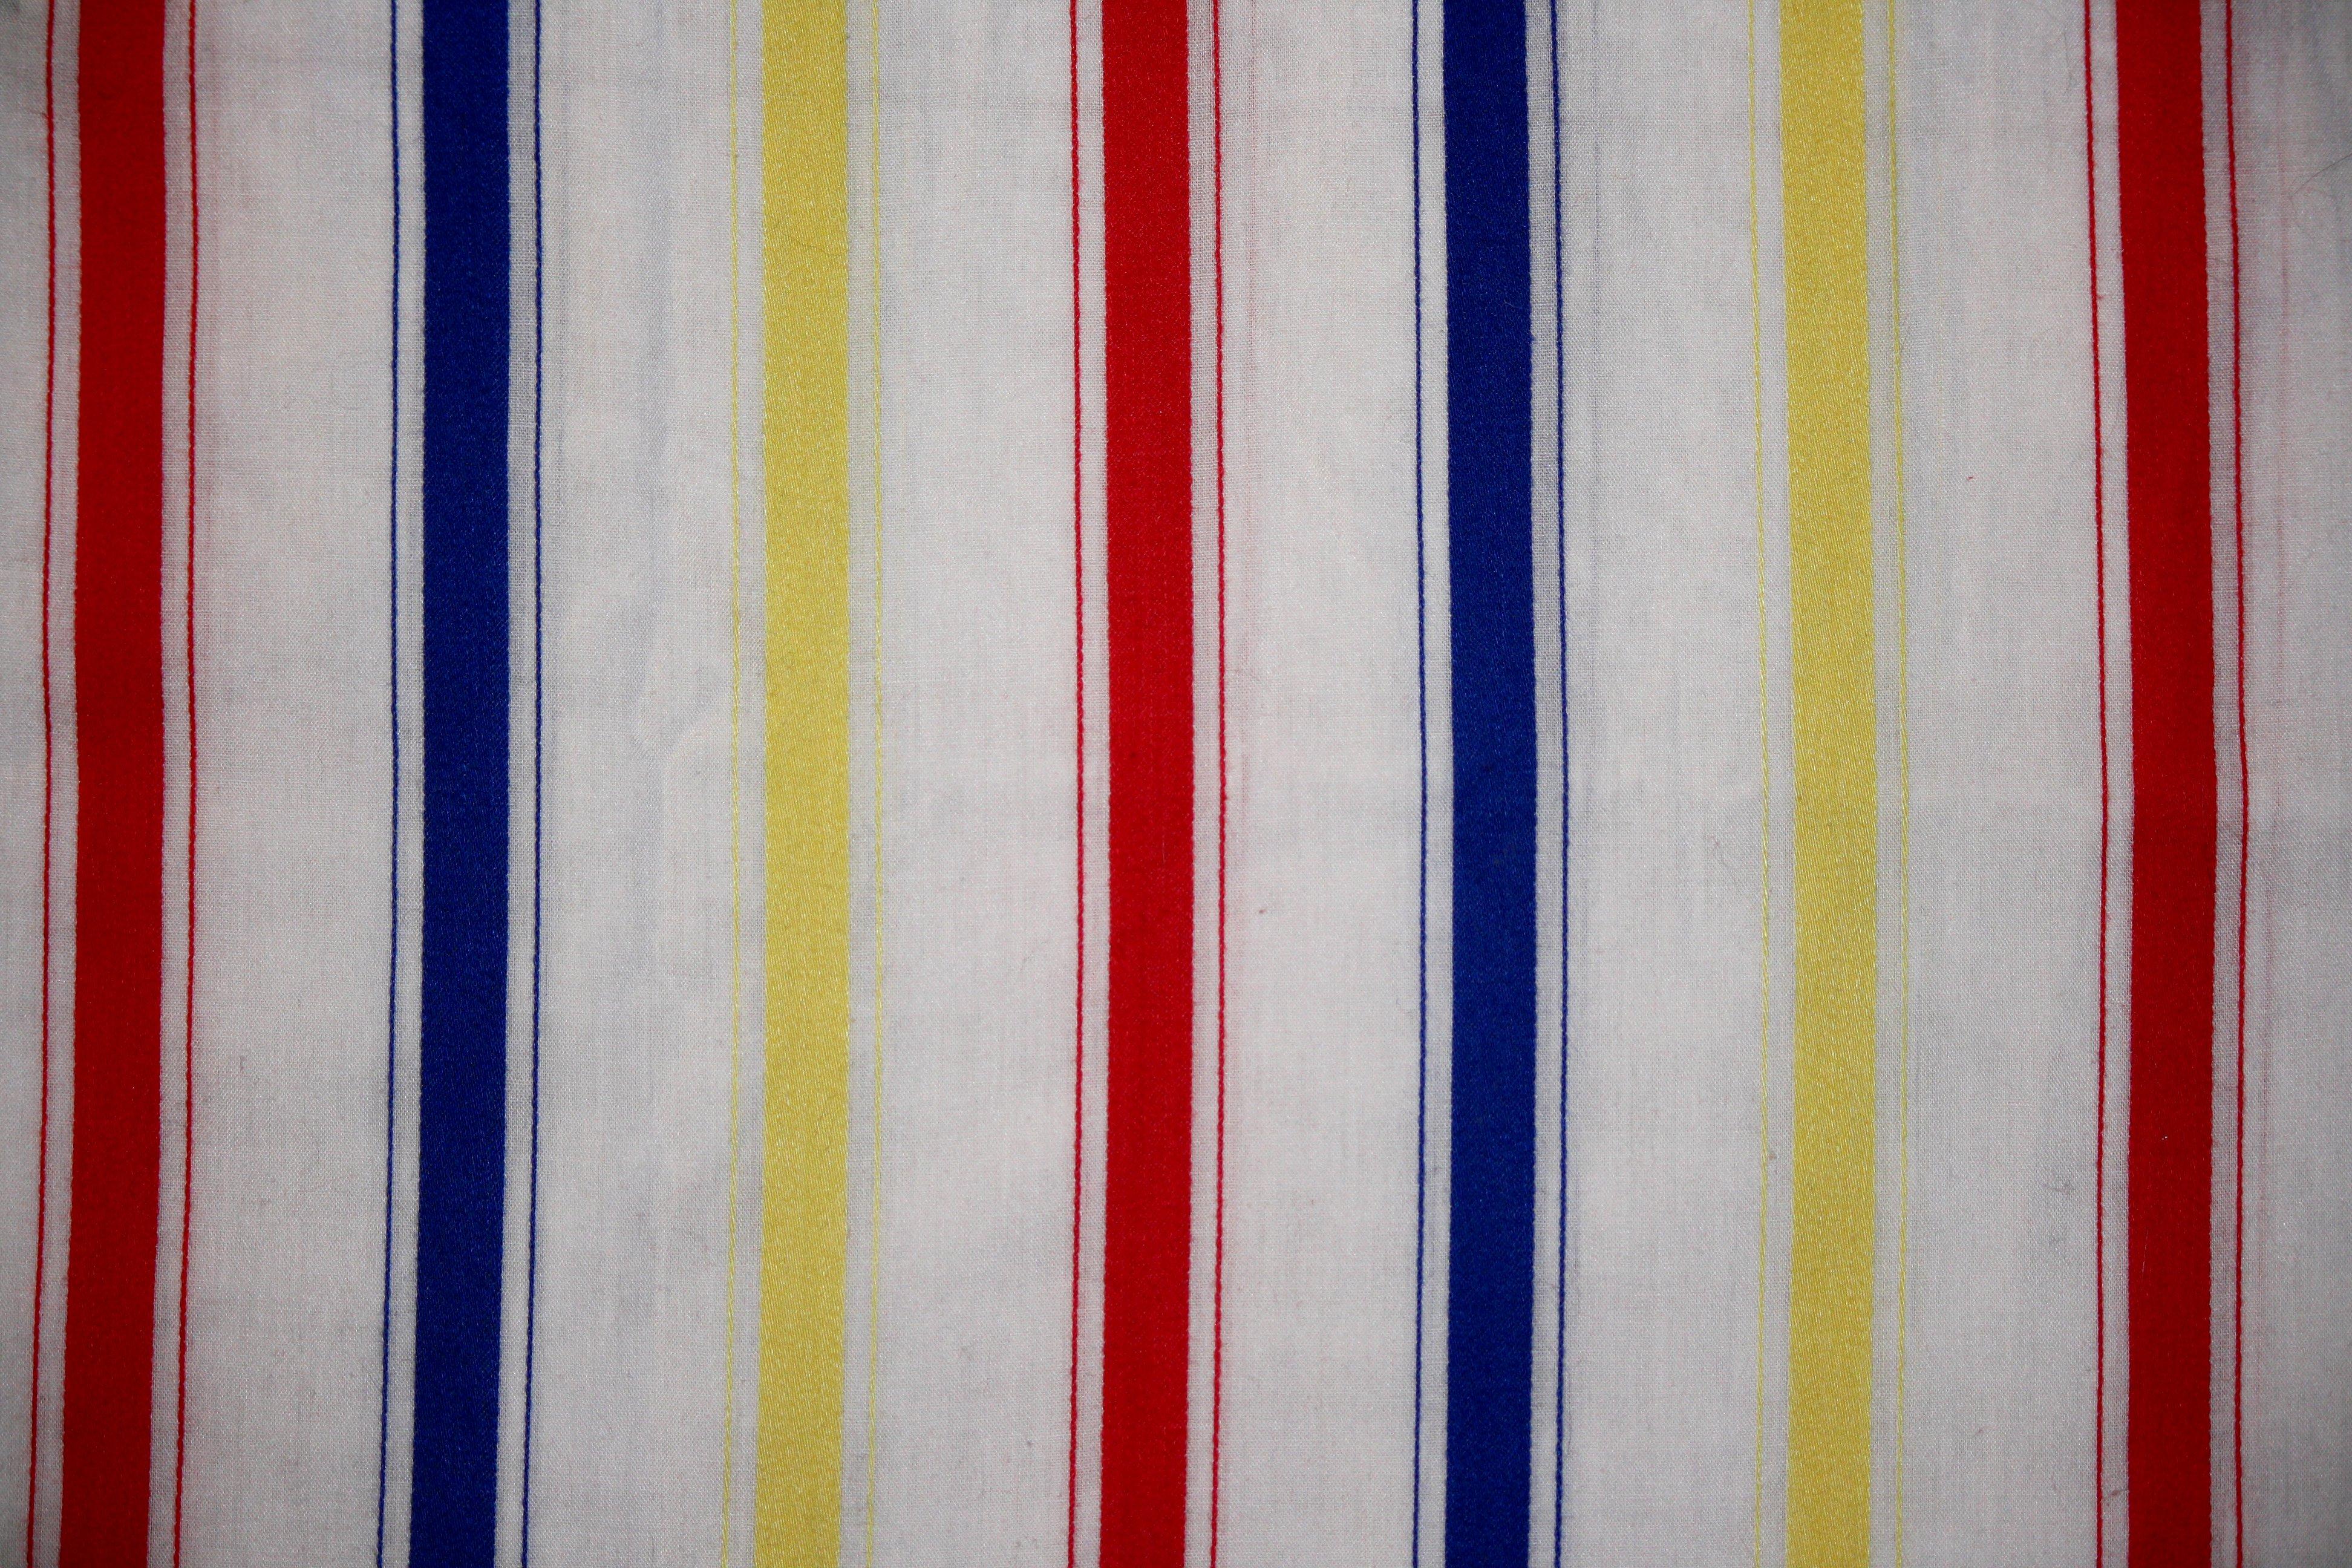 nuLOOM Handmade Striped Shaggy Blue Multi Runner Area Rugs